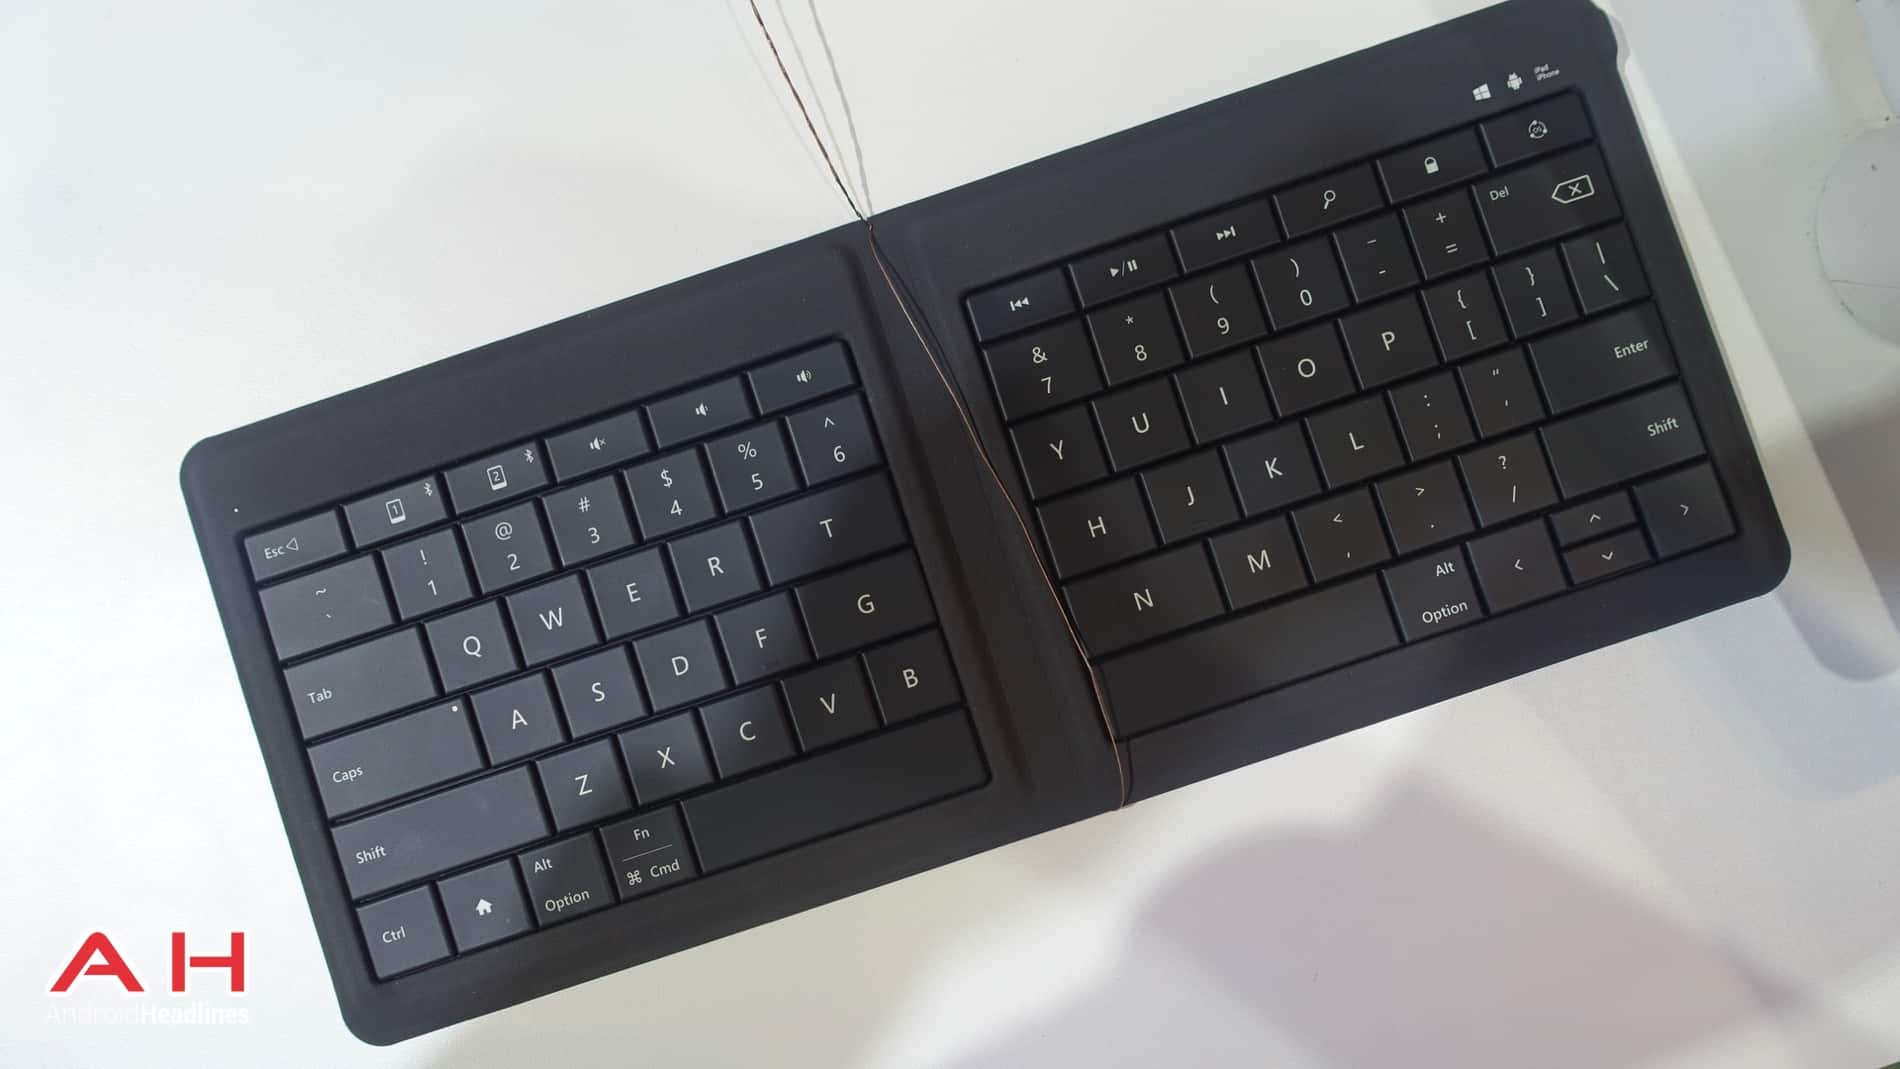 Microsoft Folding Keyboard AH 08